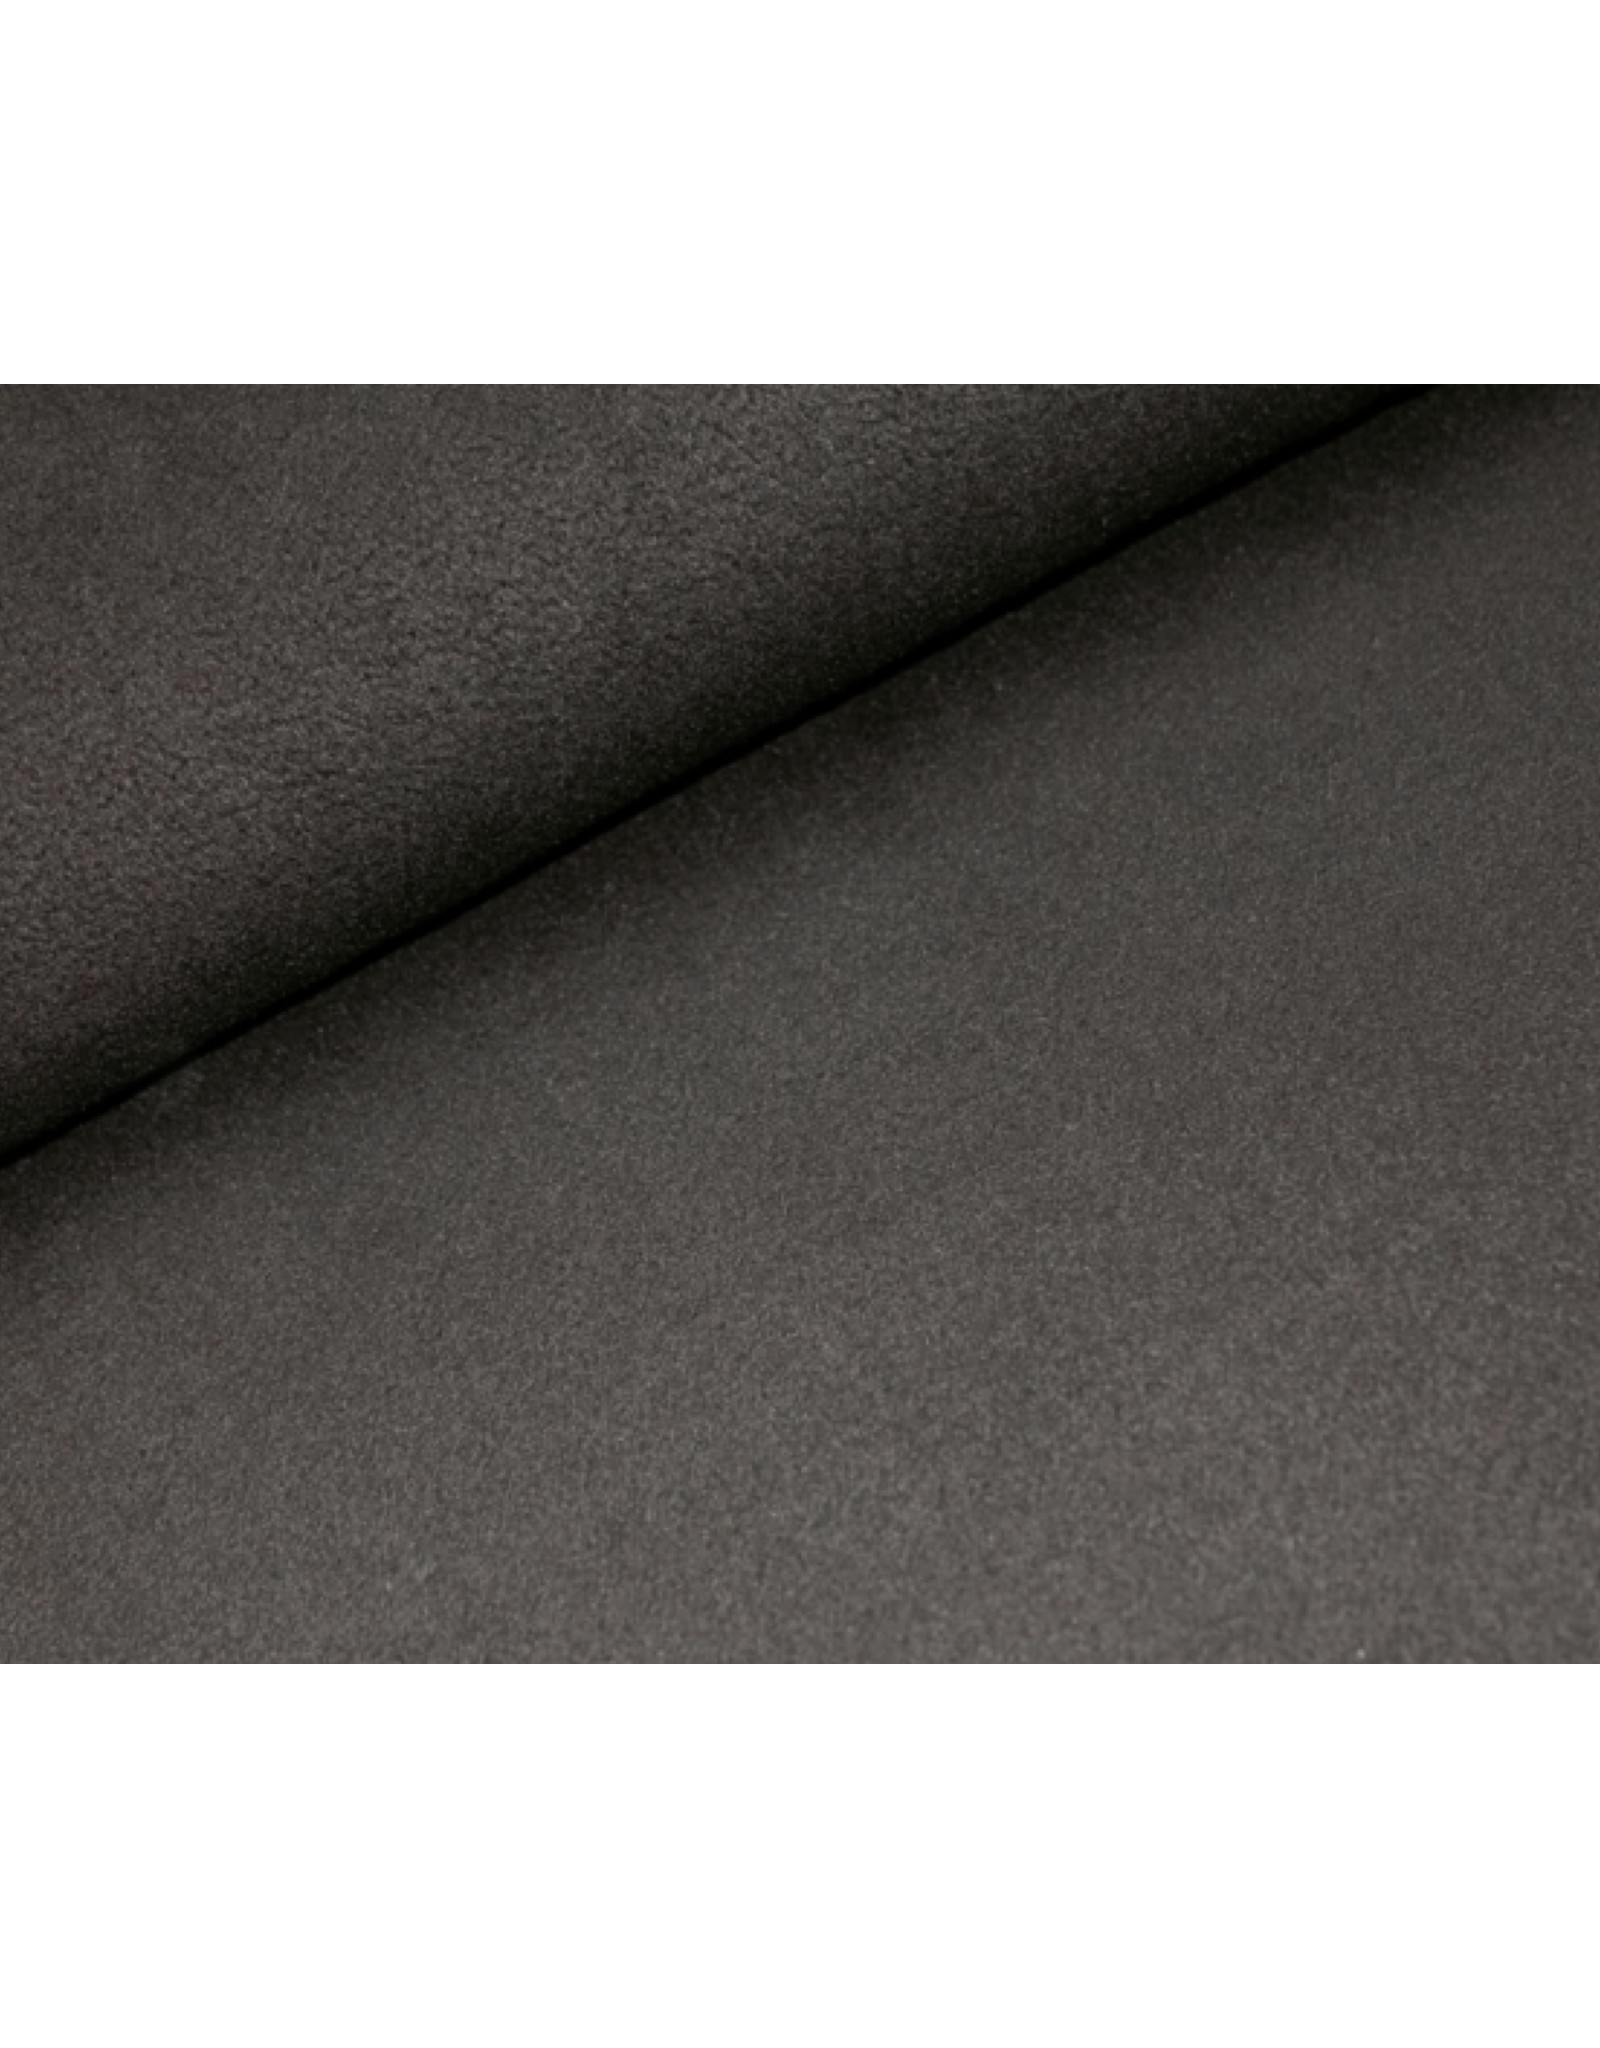 Polar Fleece fabric Black